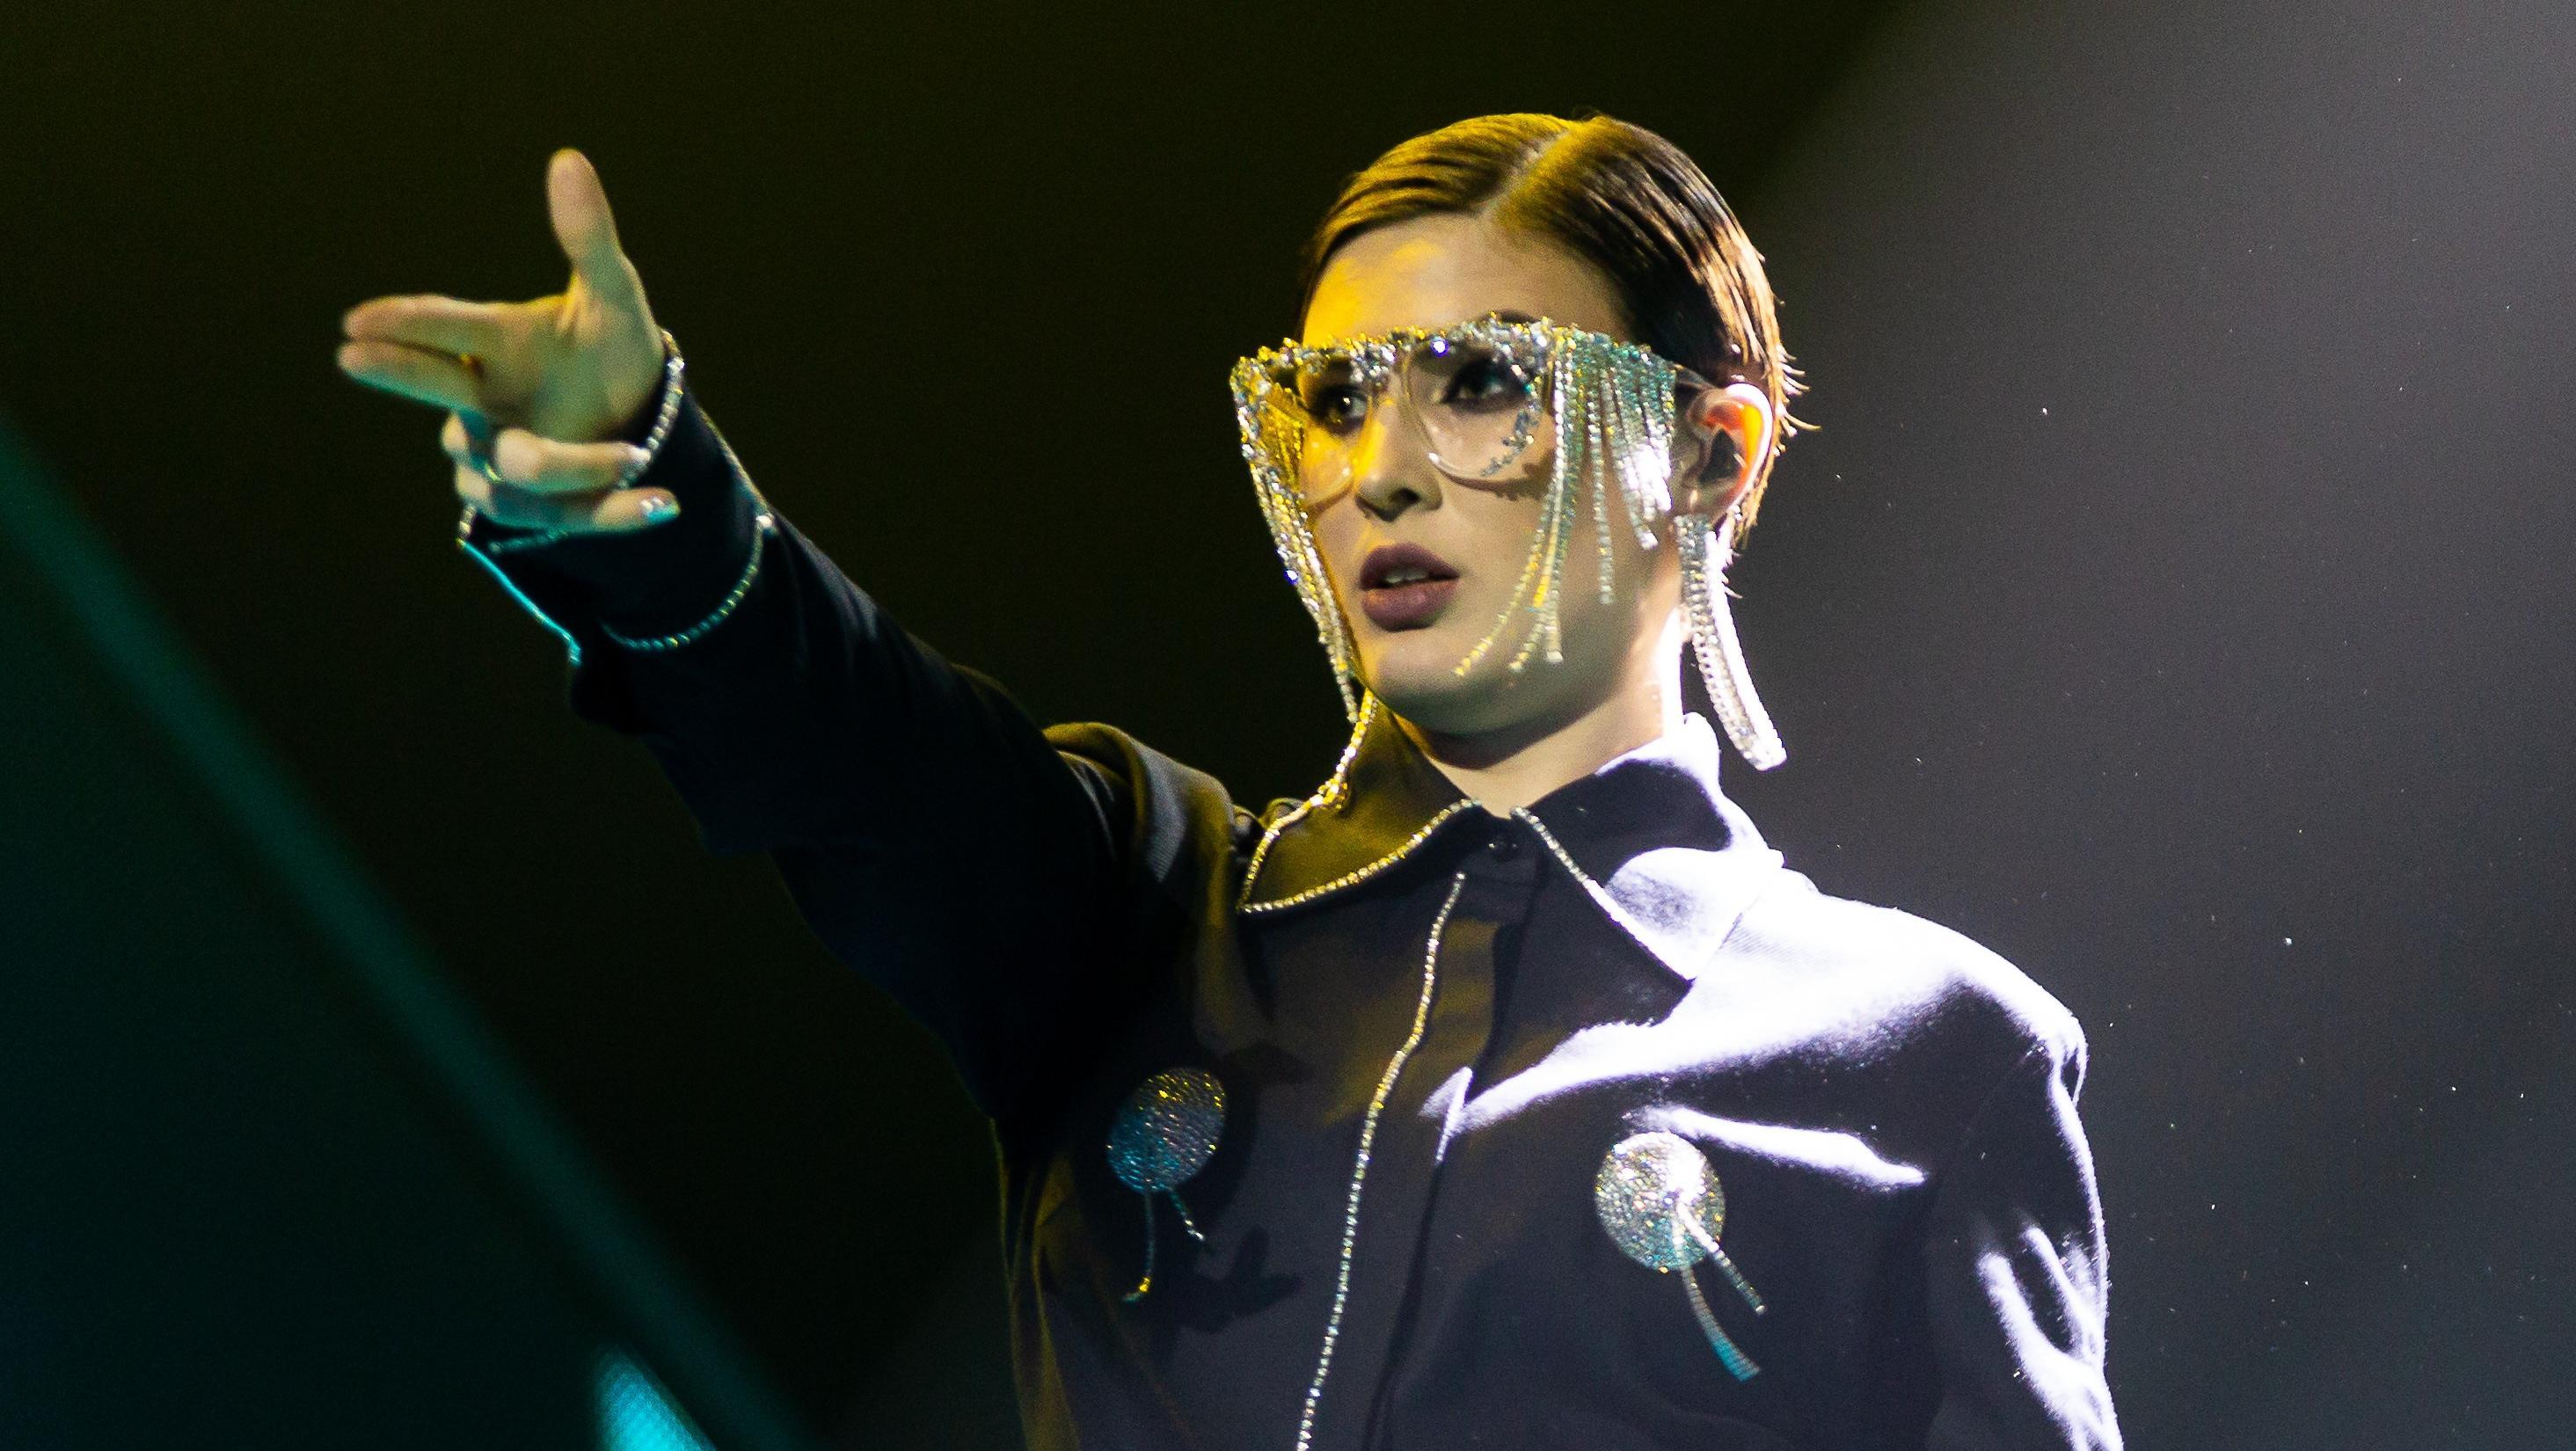 Maruv Eurovision 2019